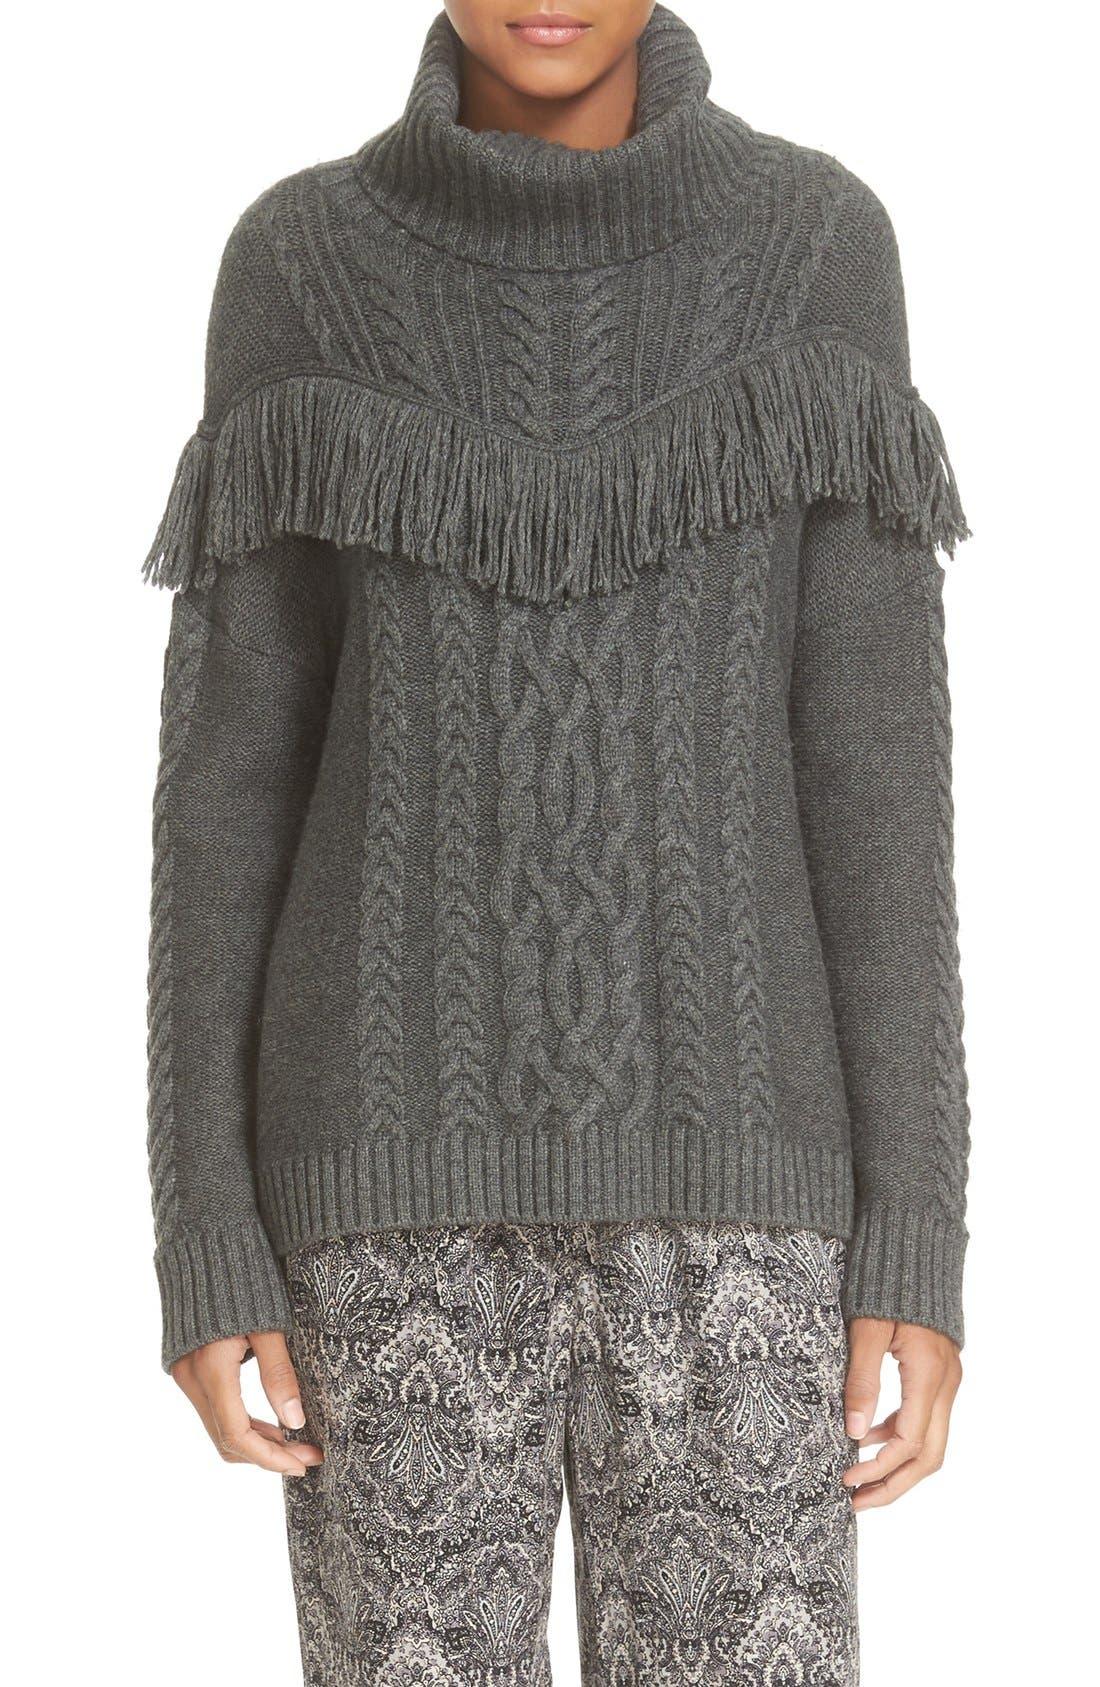 'Viviam' Fringe Cable Turtleneck Sweater, Main, color, 076